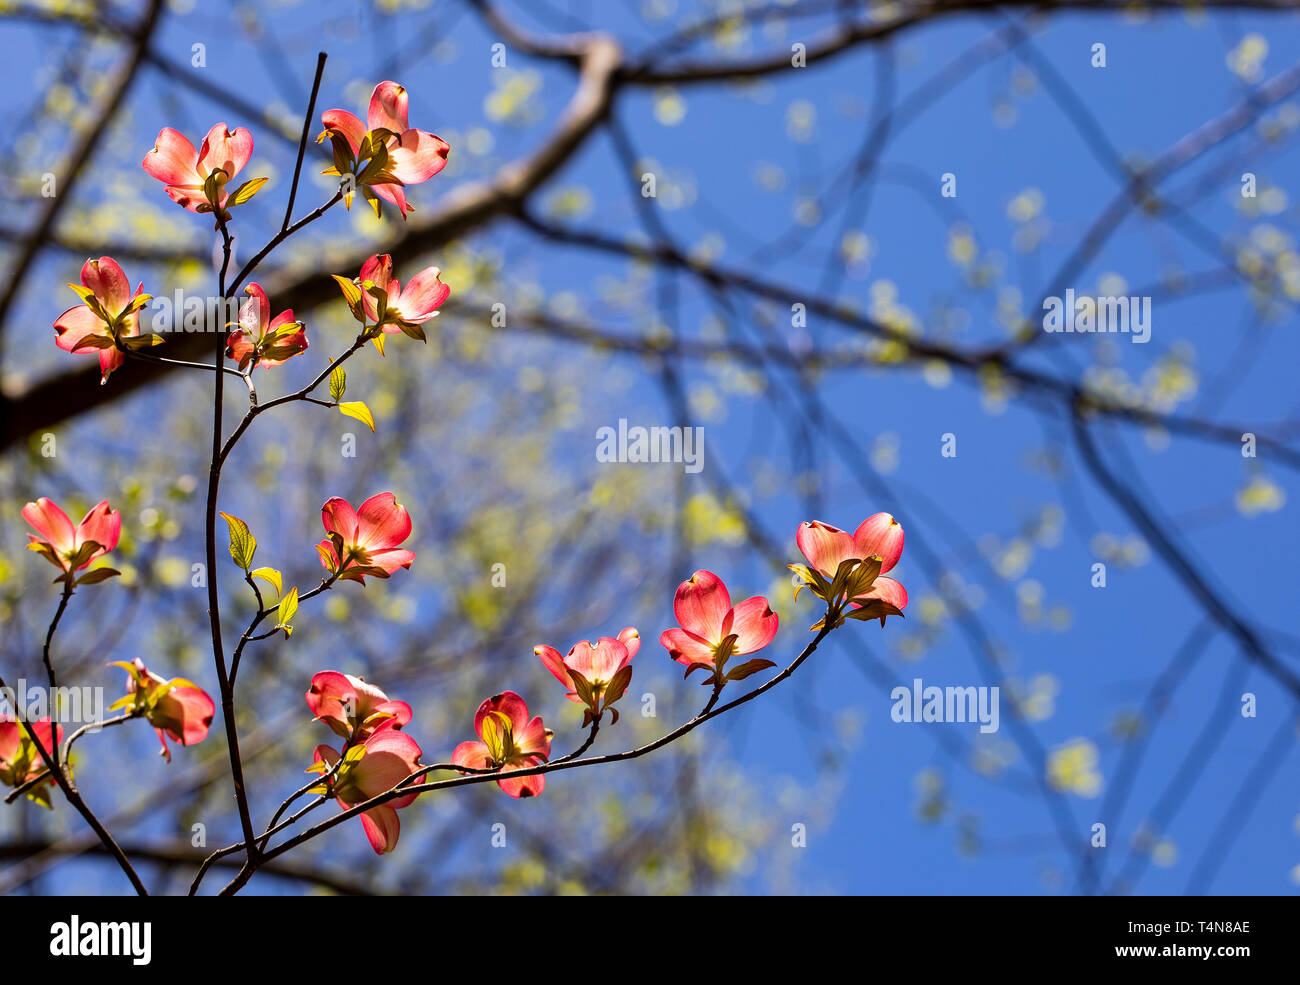 Pink dogwood blooms illuminated in the North Carolina woods. Stock Photo